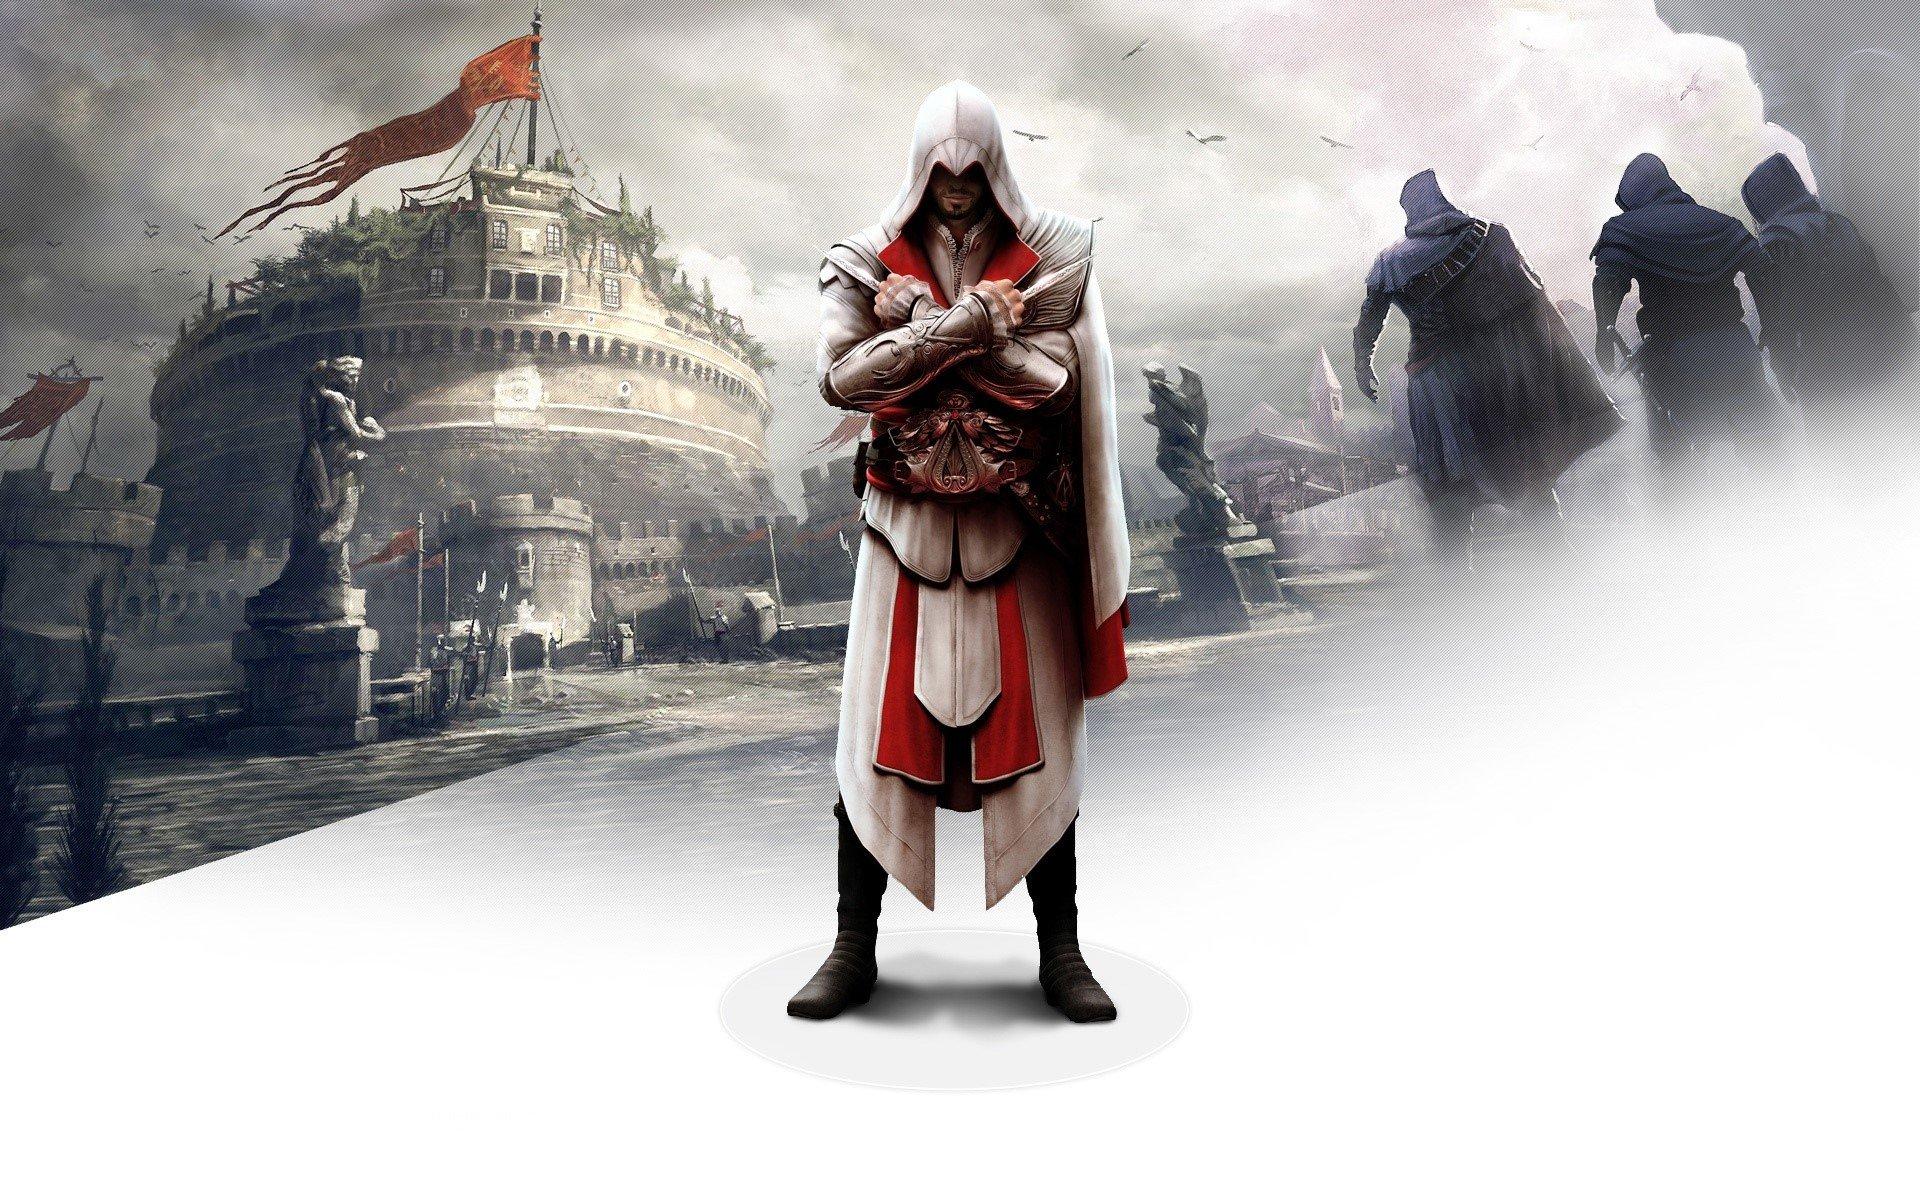 Wallpaper Ezio in Assasins Creed: The brotherhood